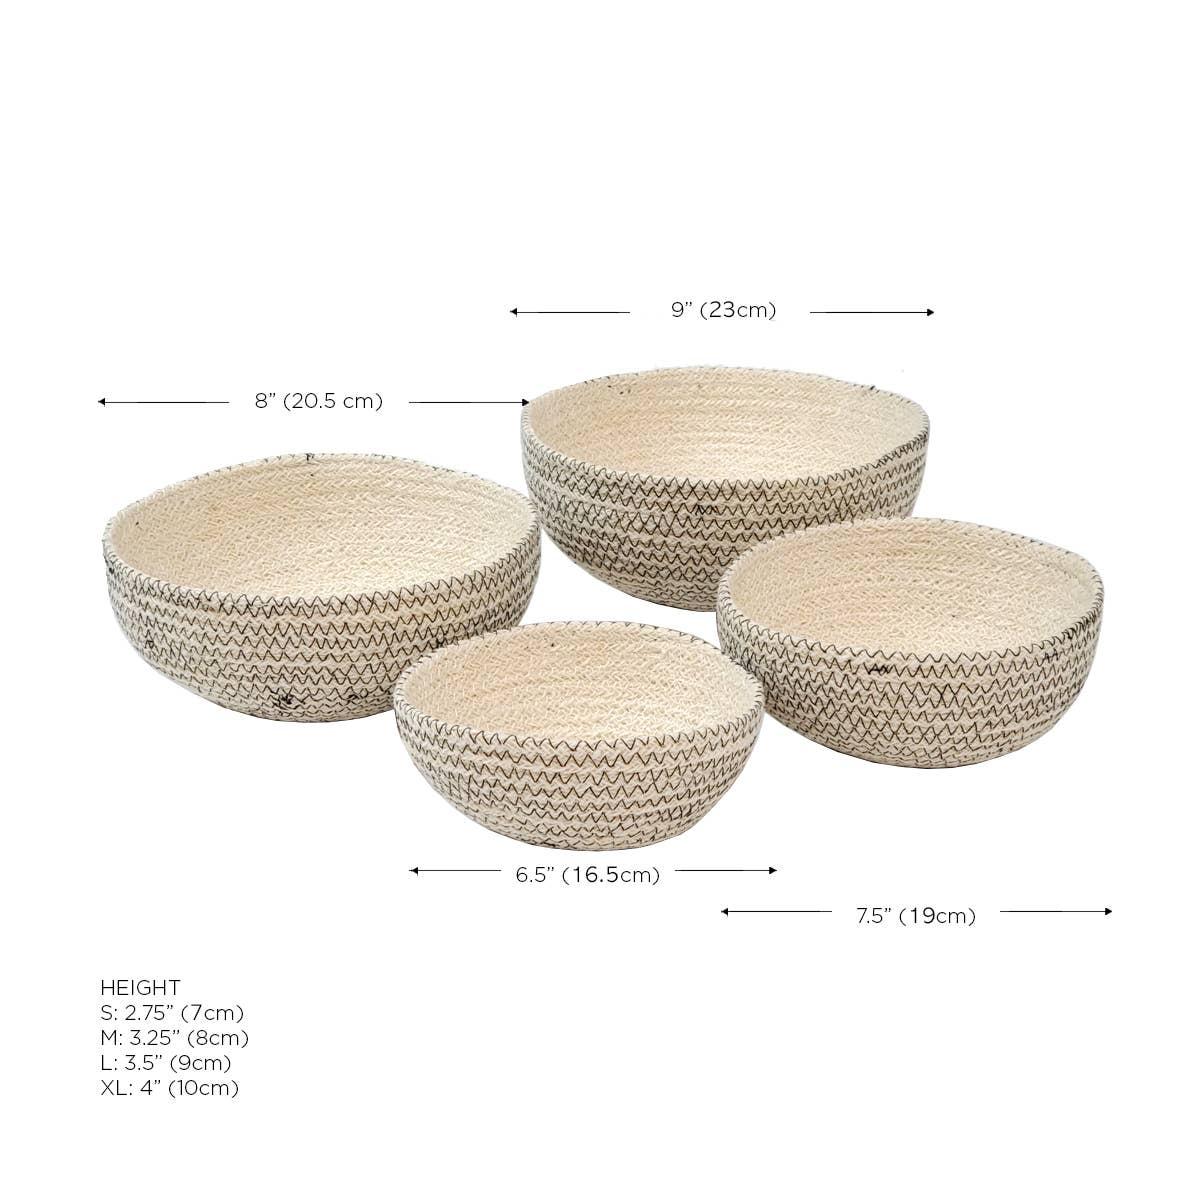 Amari Round Bowl - Black (Set of 4)   Trada Marketplace